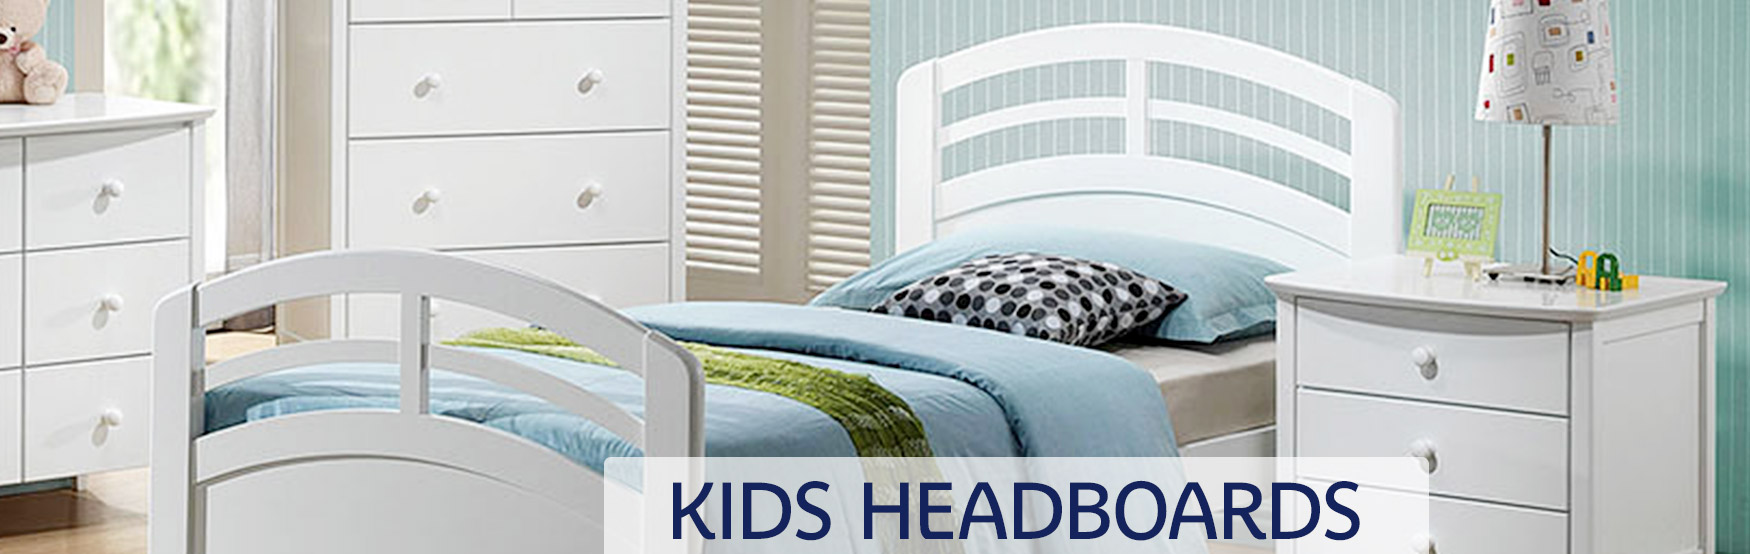 Kids Headboards Banner